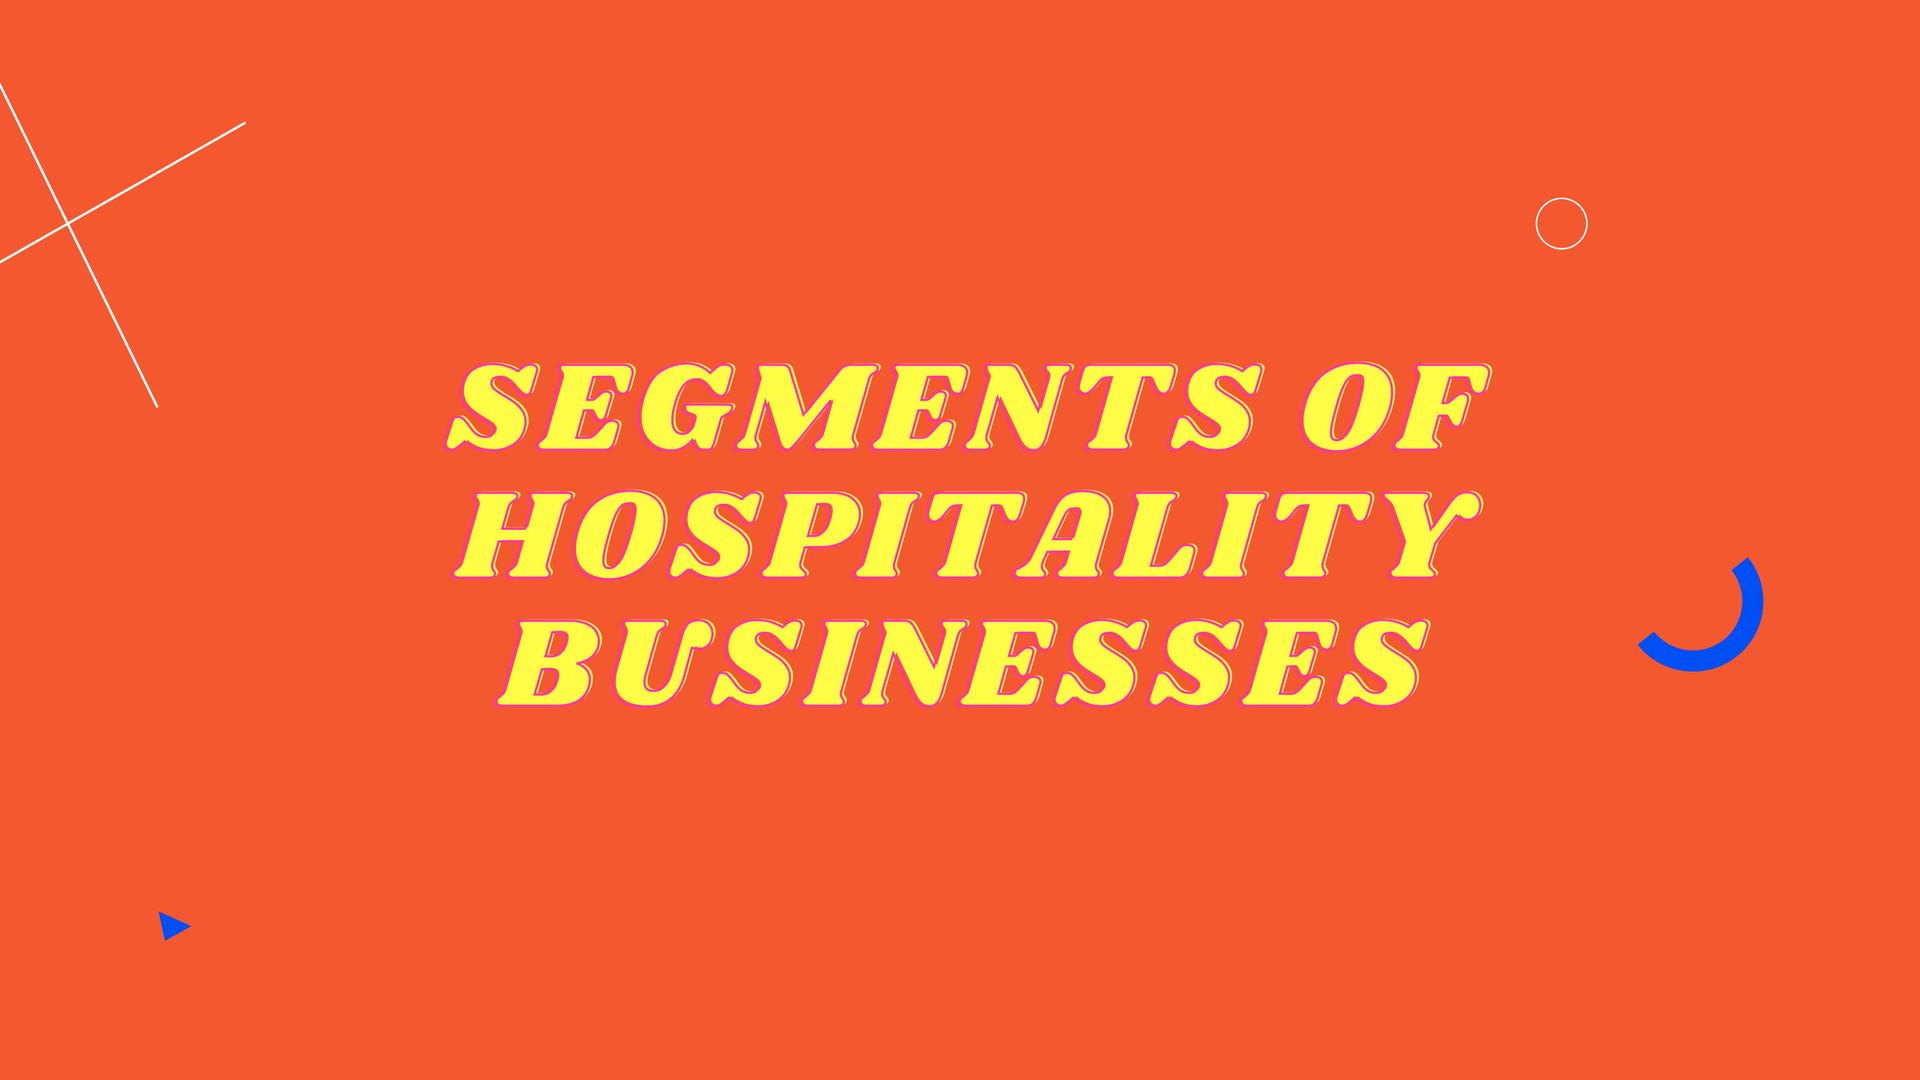 hospitality in business-09.jpg